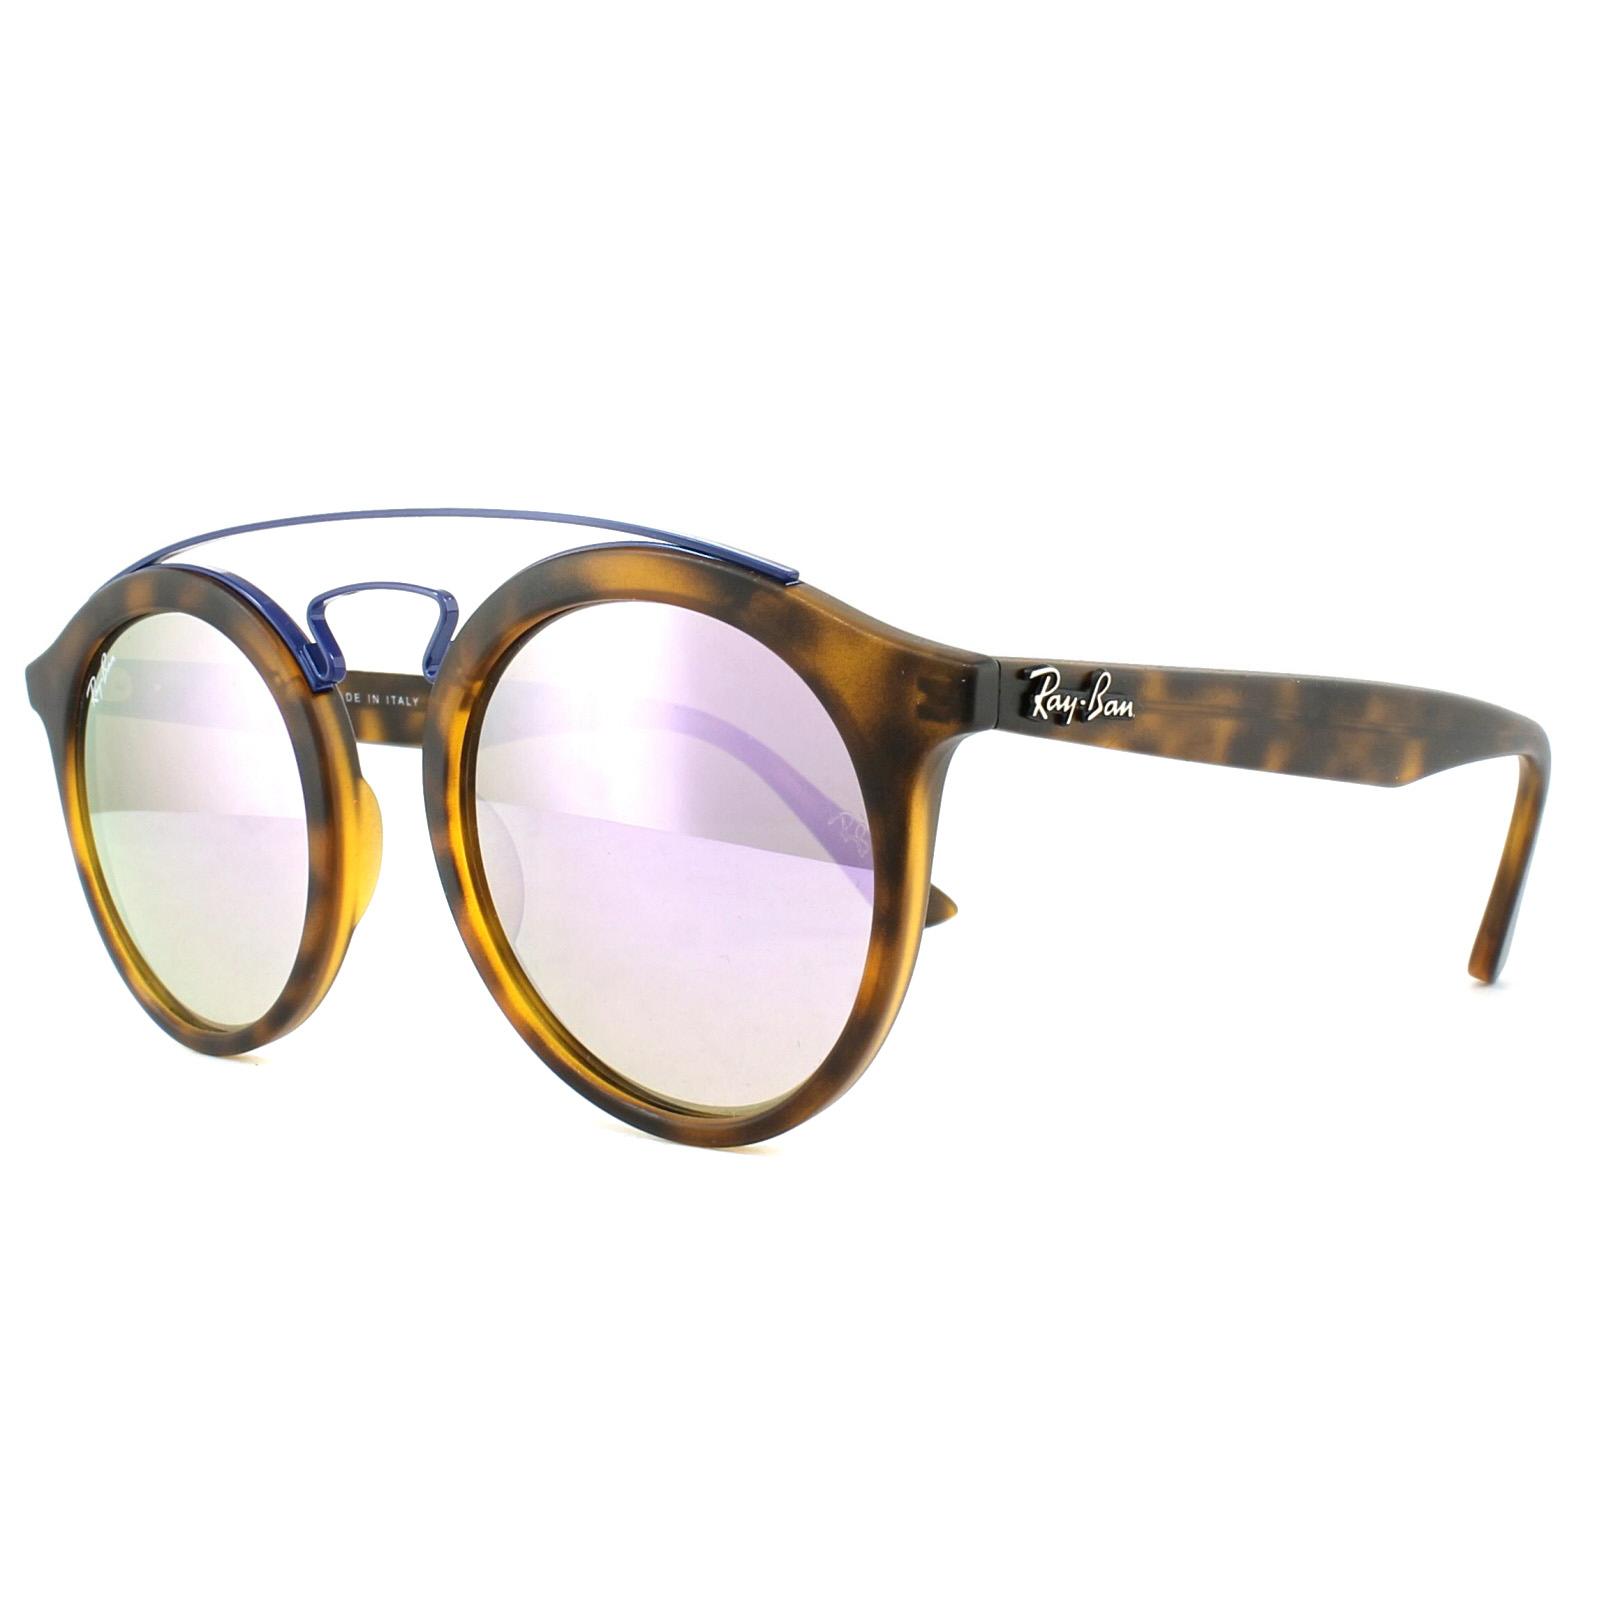 20b0f752a7 Sentinel Ray-Ban Sunglasses Gatsby 4256 6266B0 Tortoise Lilac Gradient  Mirror 46mm